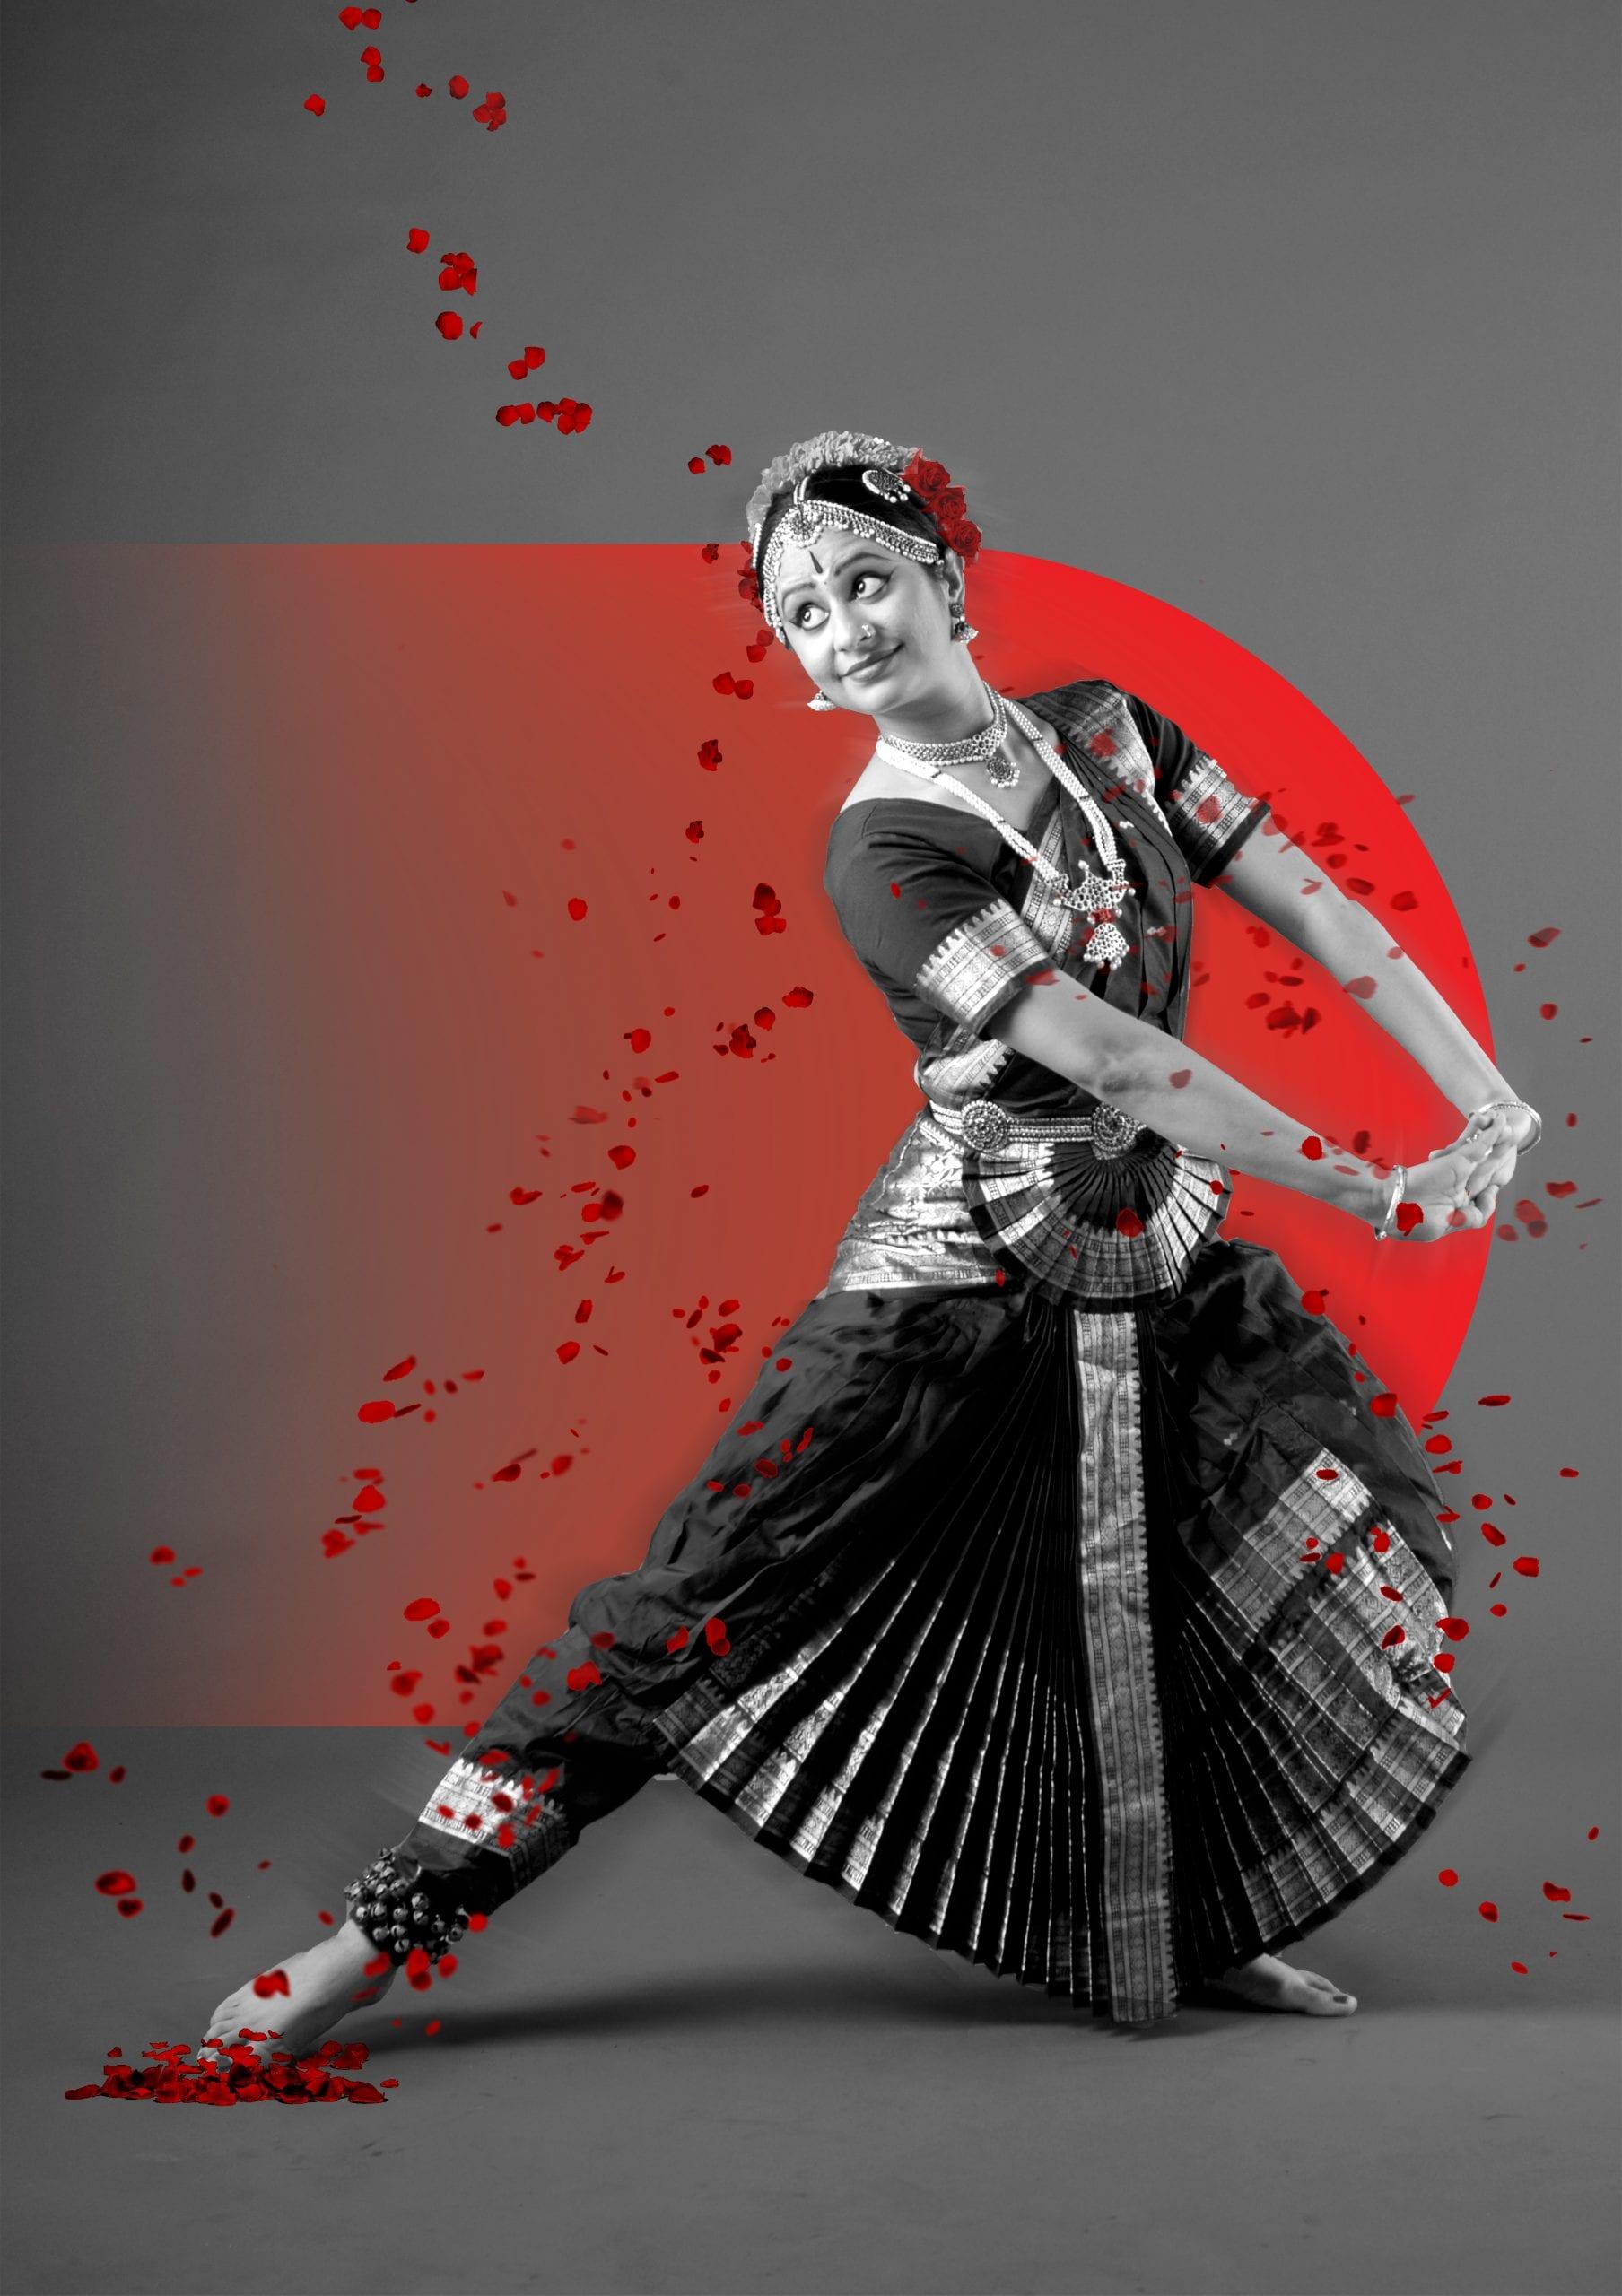 Bharatanatyam dance artist Vidya Kotamraju poses